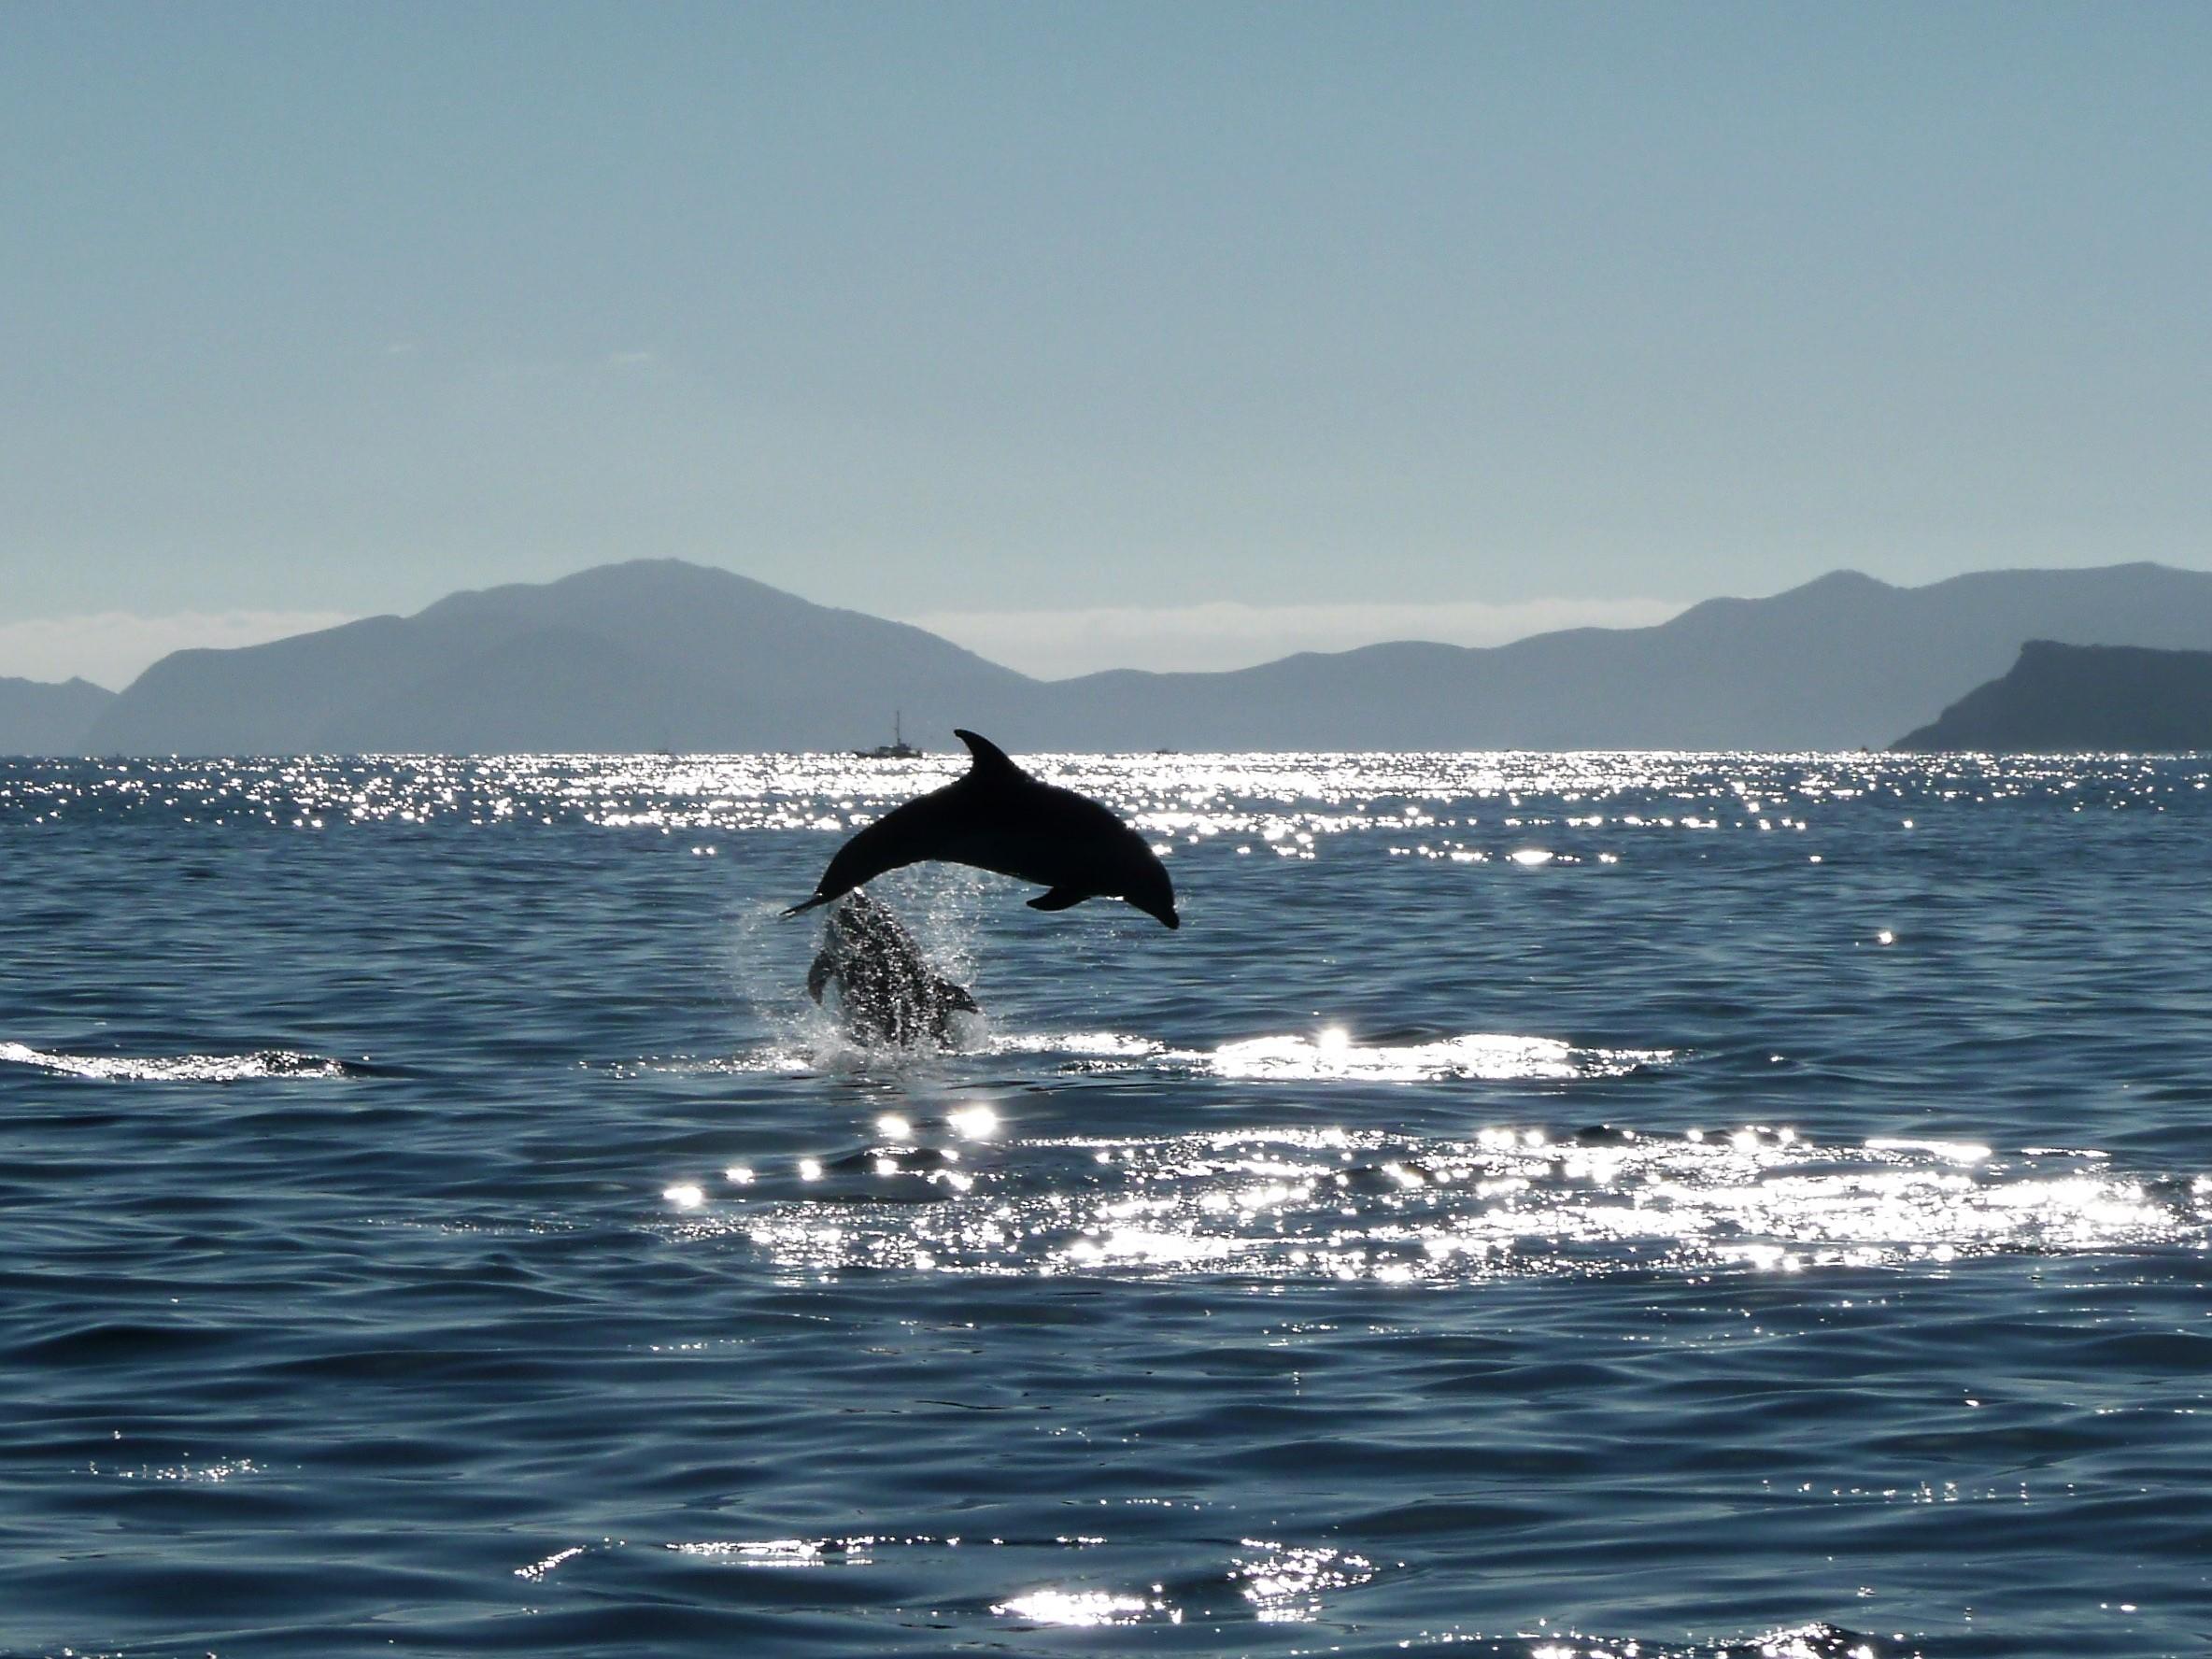 Swim with wild dolhins in Bay of Islands